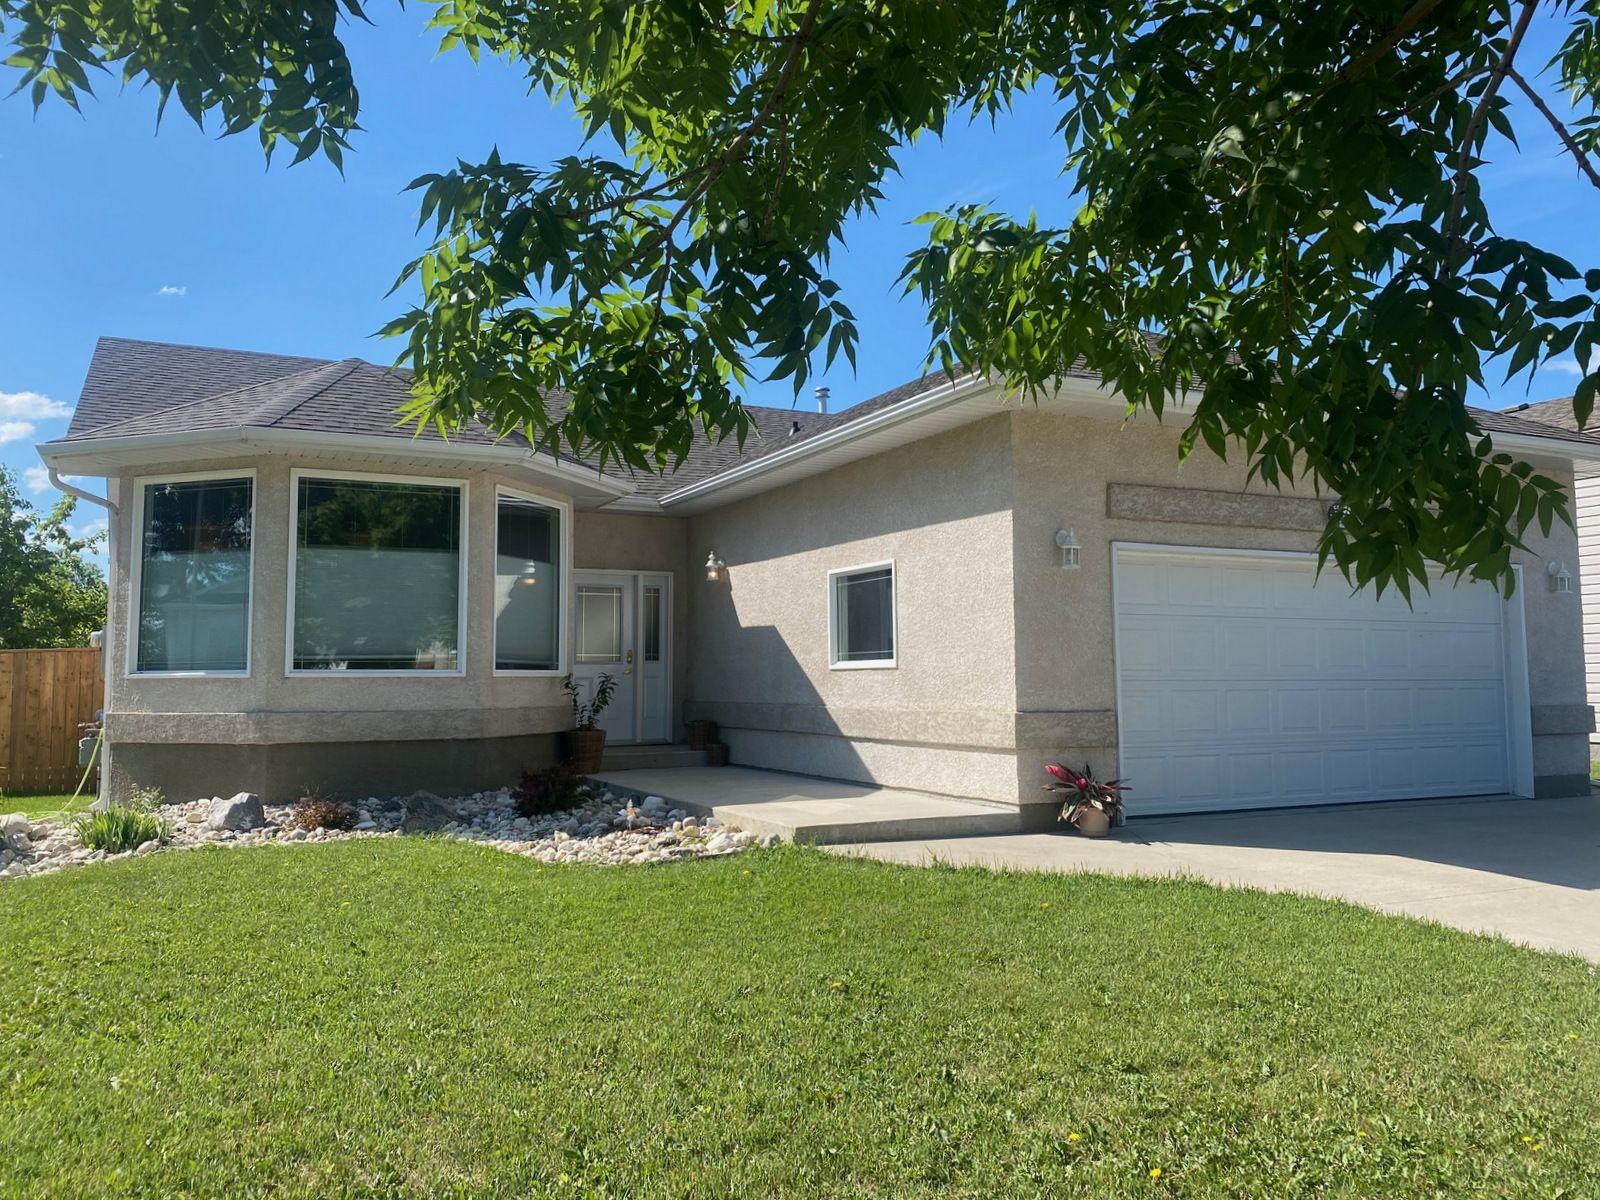 Main Photo: 19 Cadham Bay in Portage la Prairie: House for sale : MLS®# 202115588